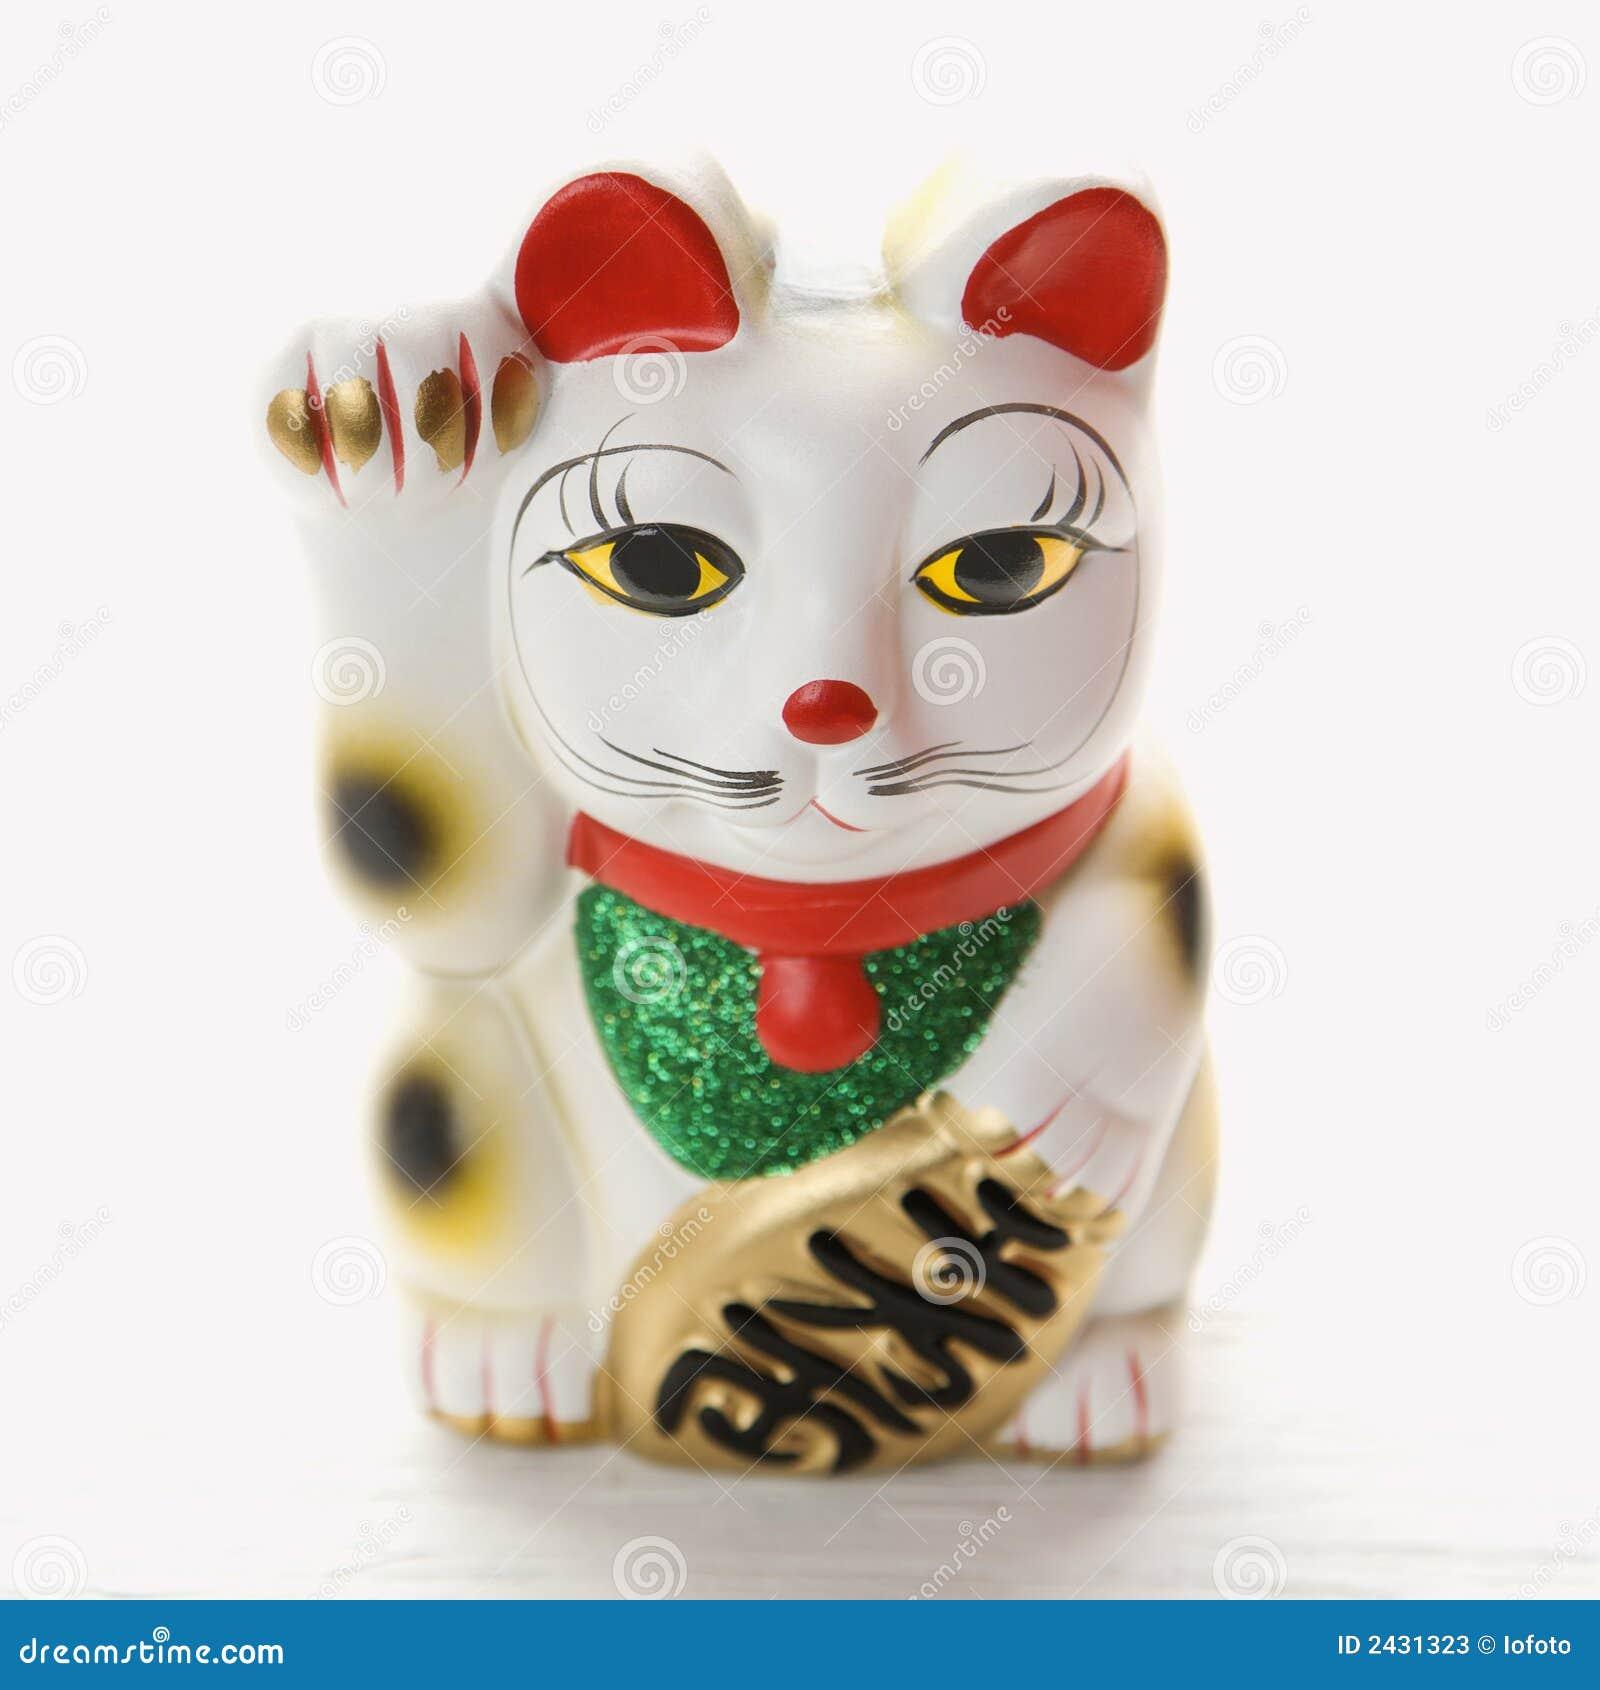 Japanese lucky cat figurine.